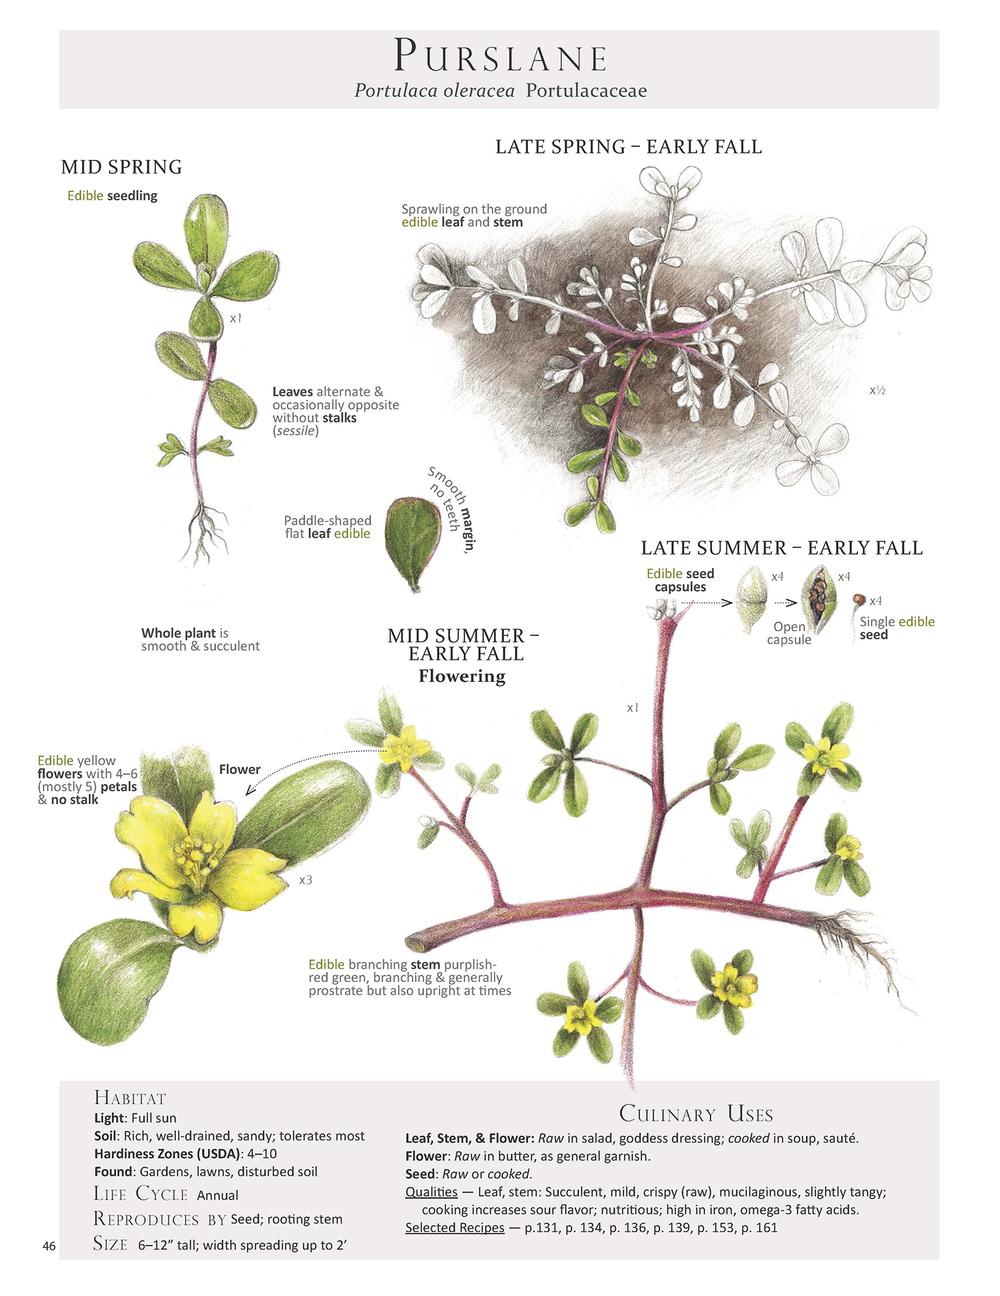 Purslane - Portulaca oleracea